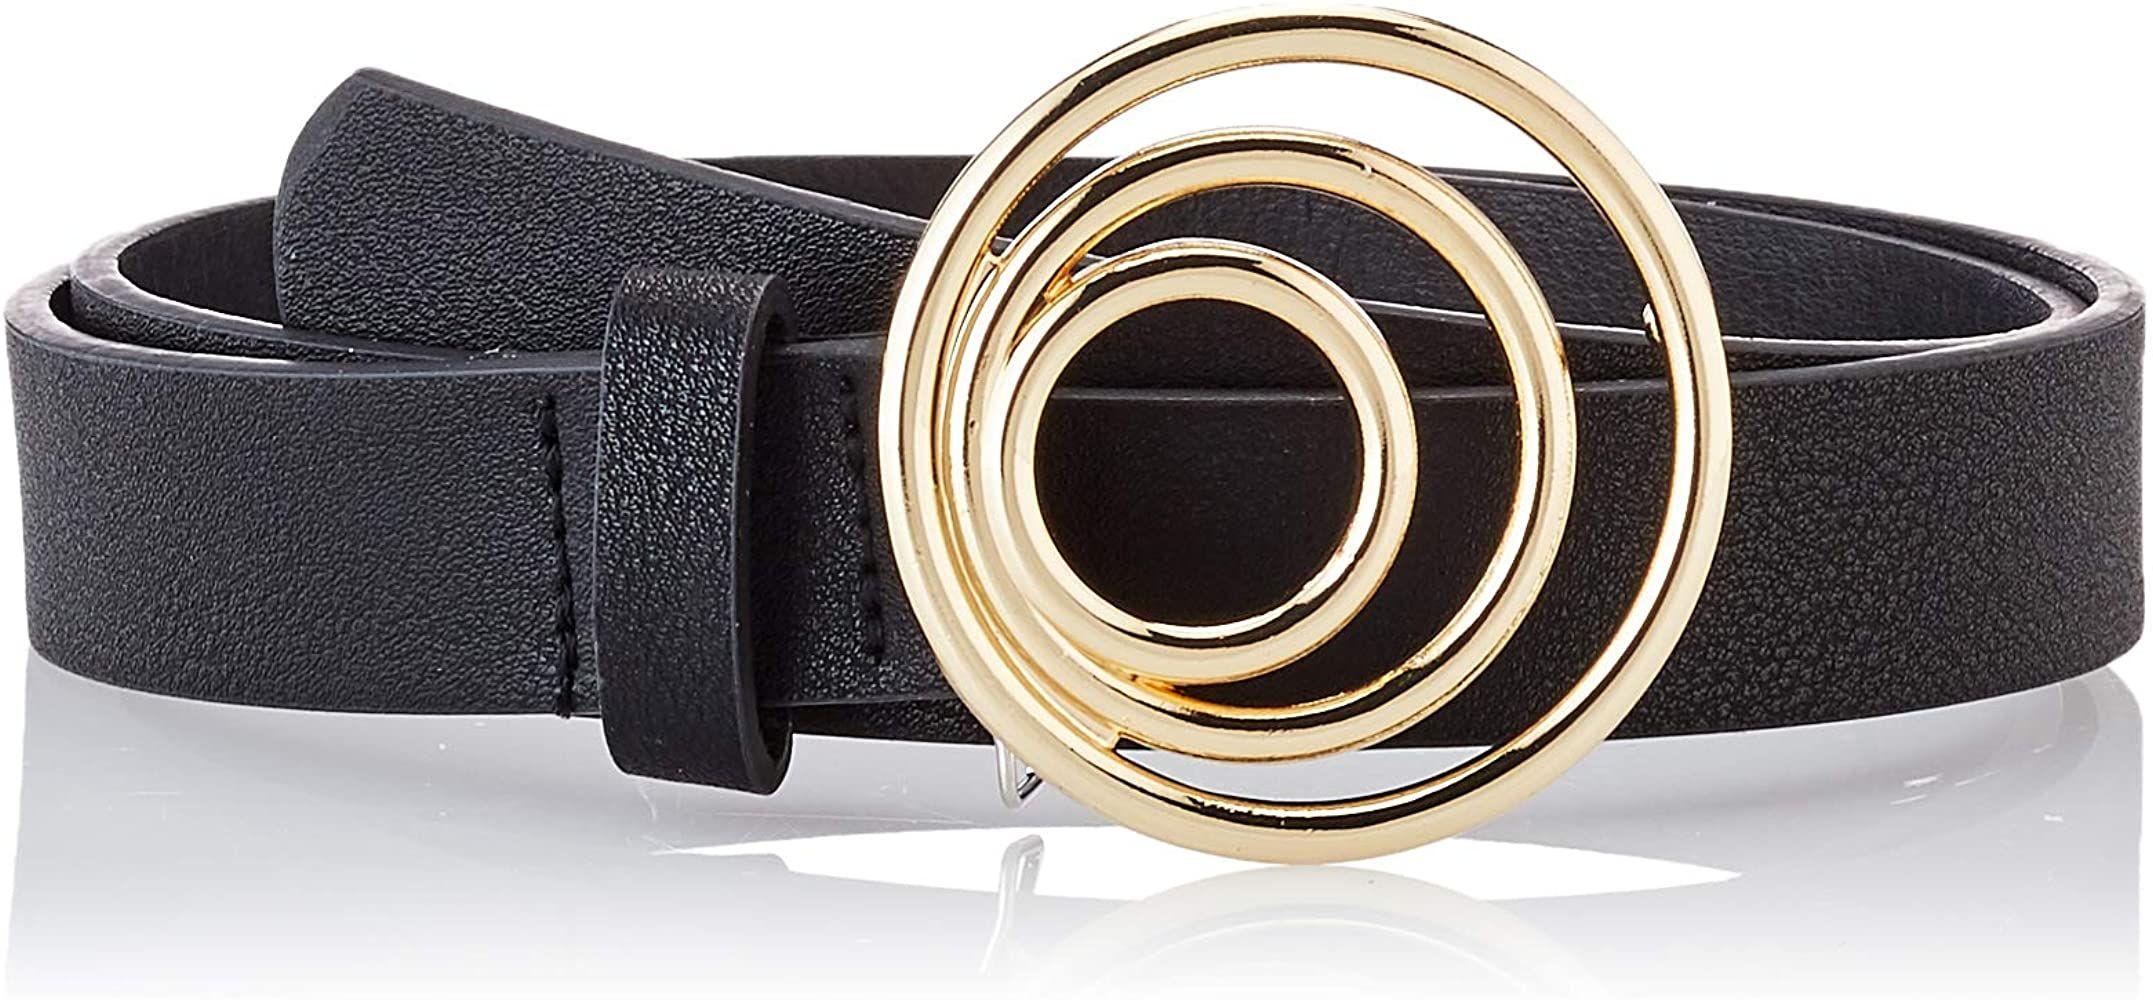 TALLA 90 - PIECES Pcneema Jeans Belt Cinturón para Mujer